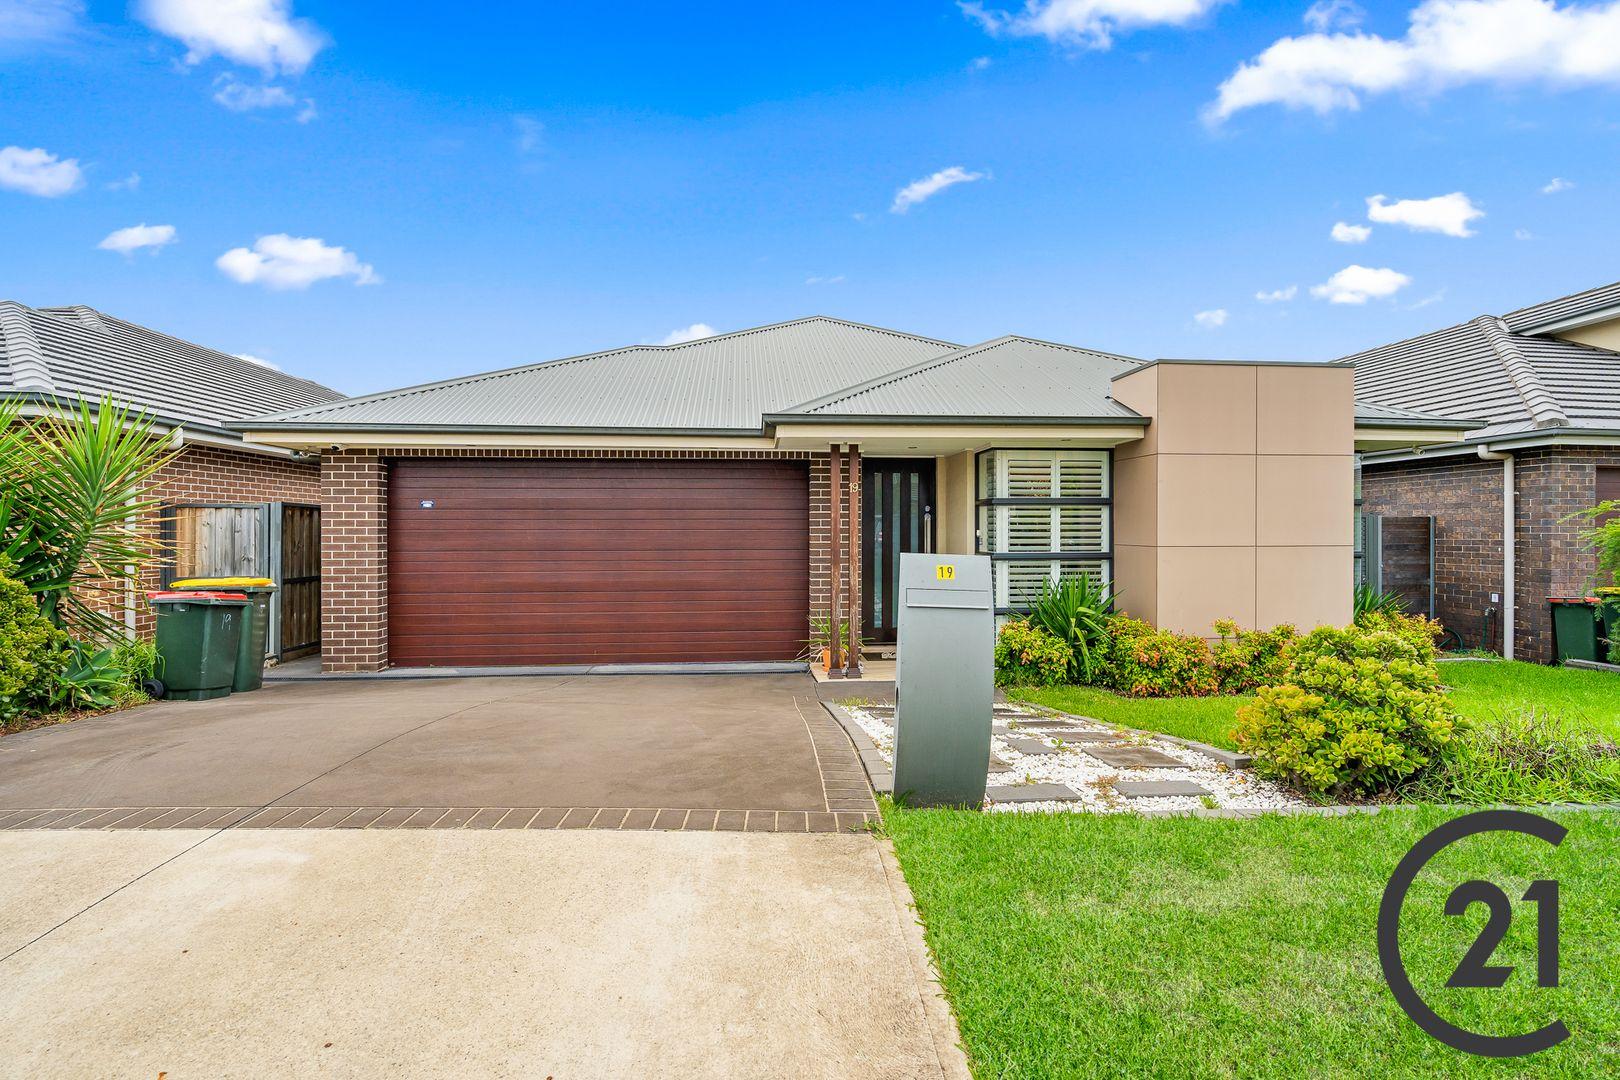 19 Fairfax St, The Ponds NSW 2769, Image 0